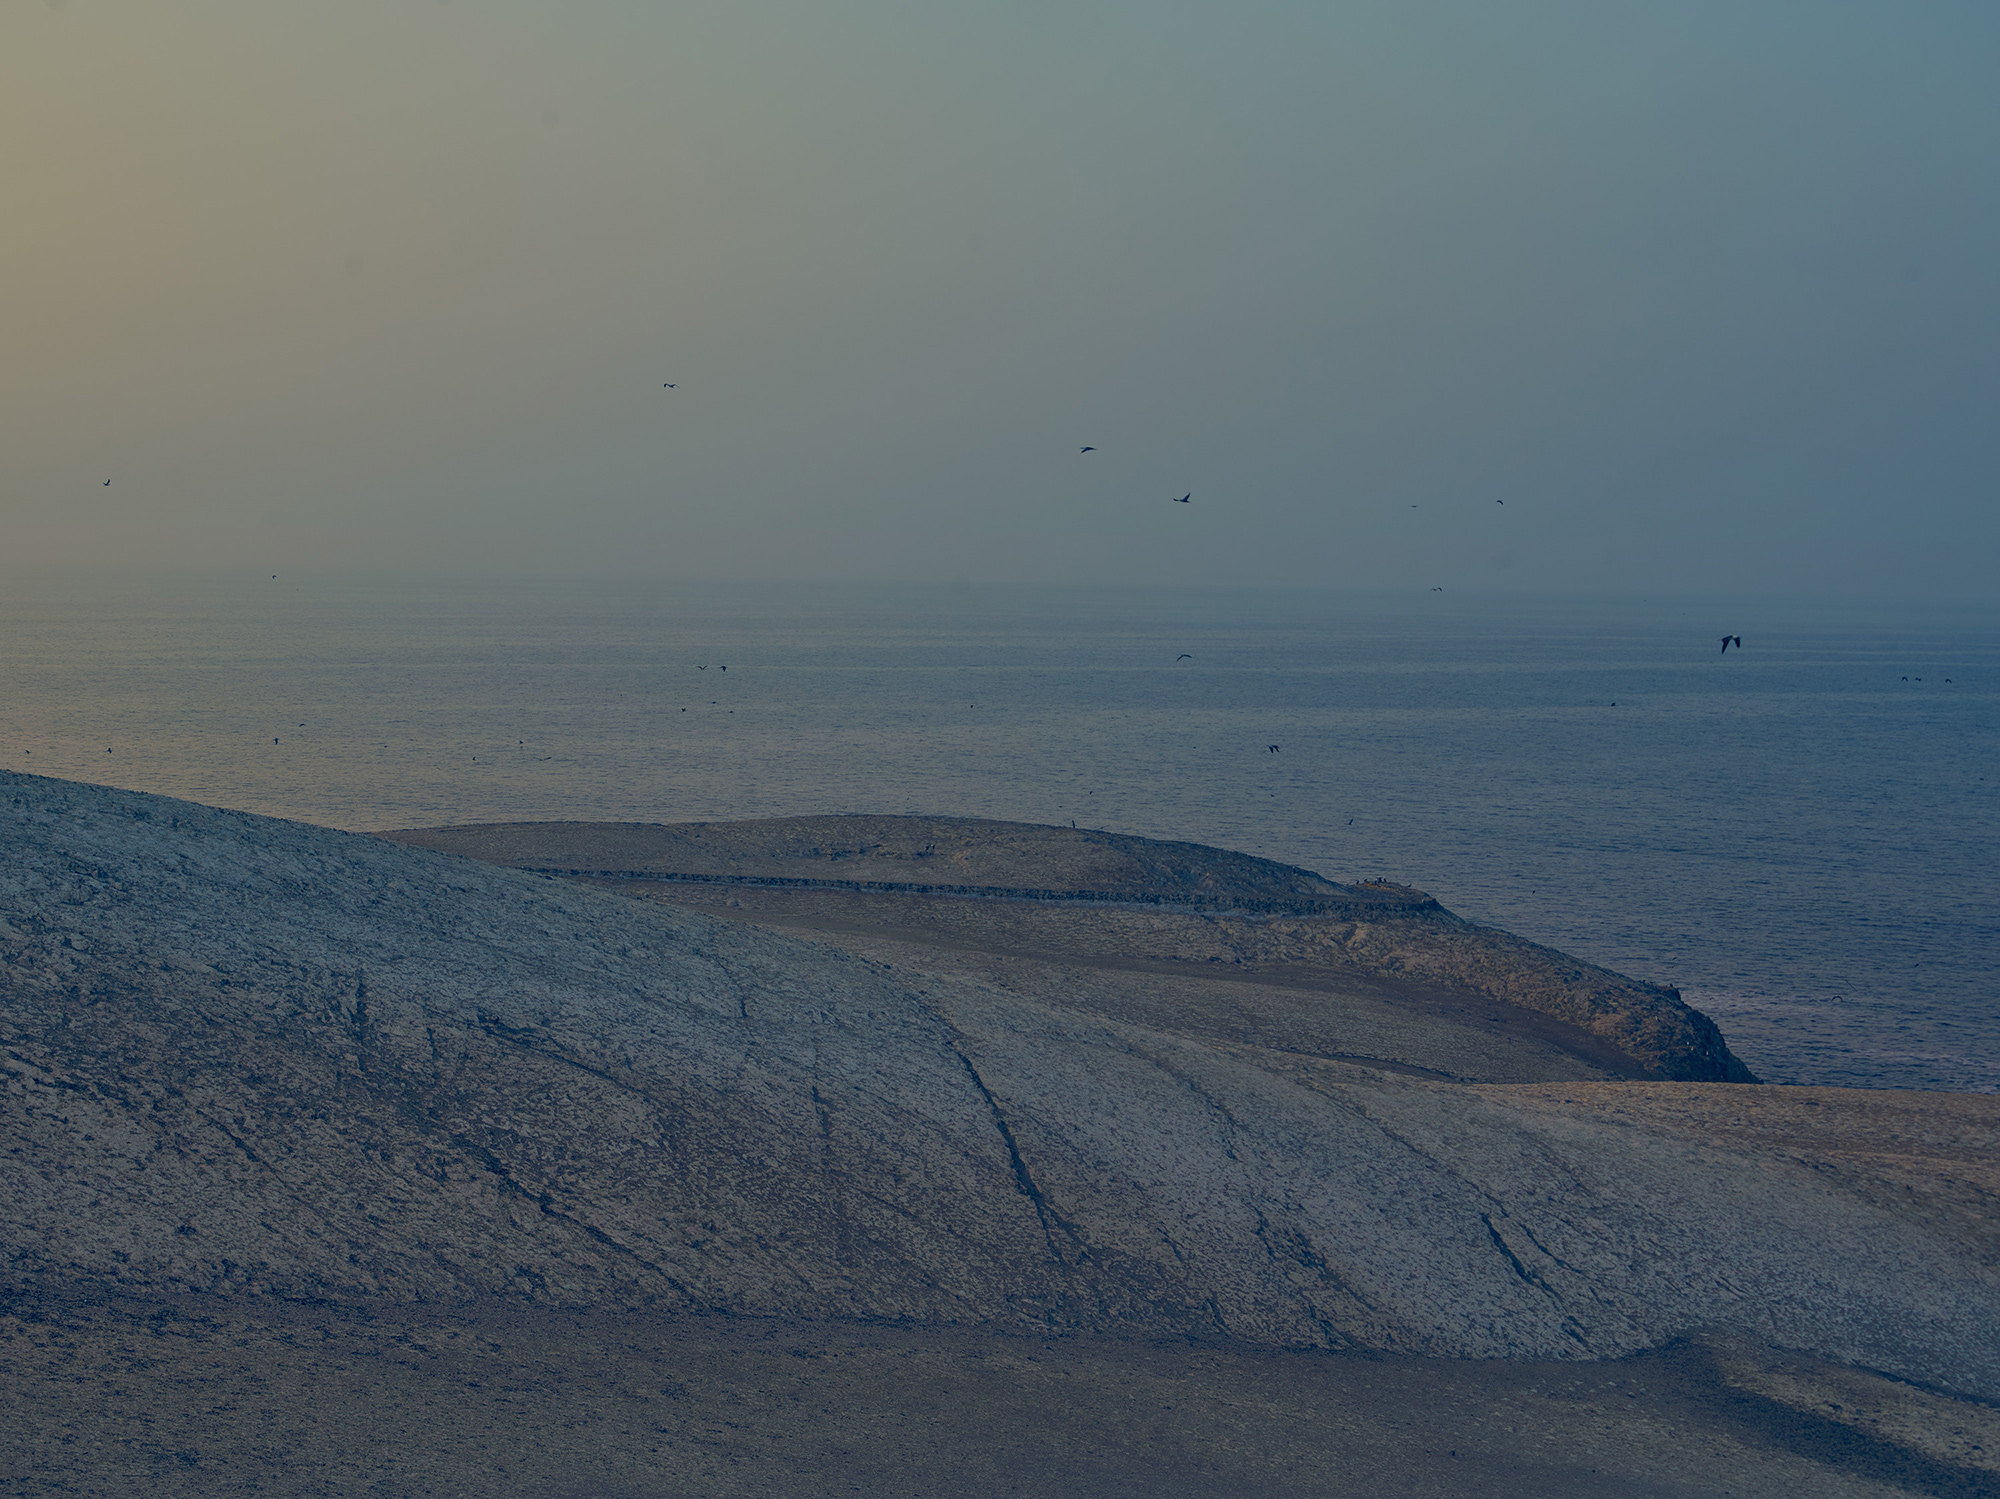 Guarda Islas - Chincha Islands, Peru